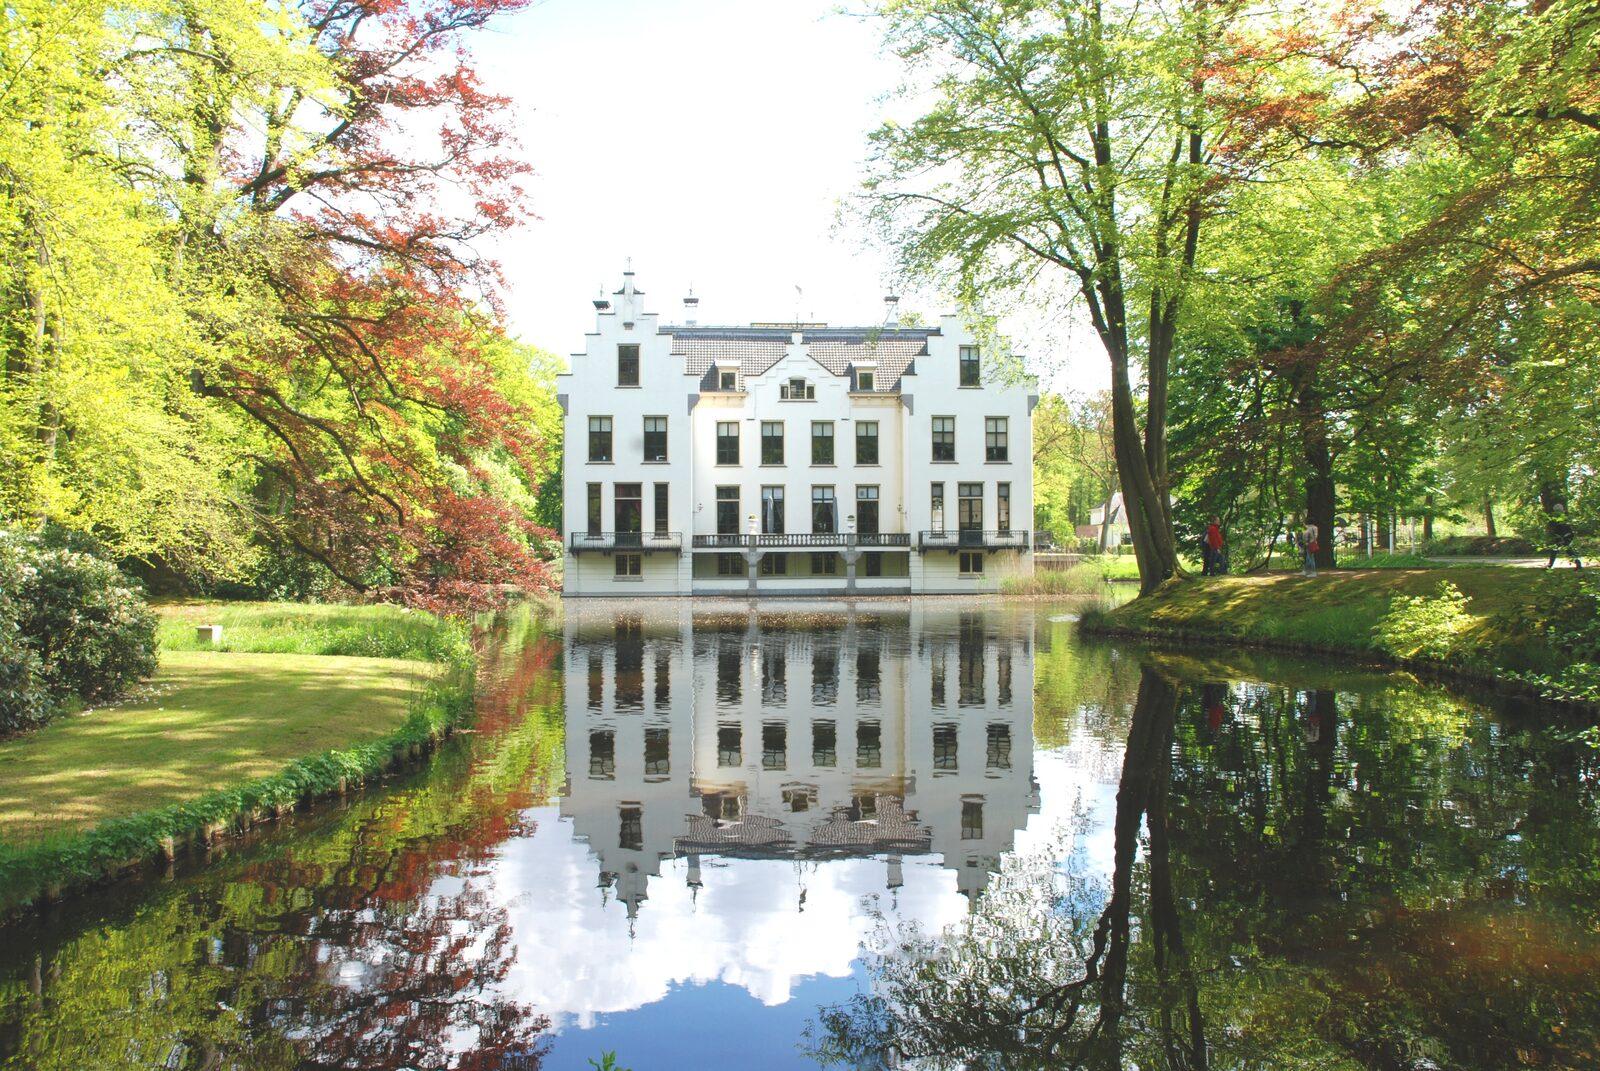 🏰 Landgoed Staverden